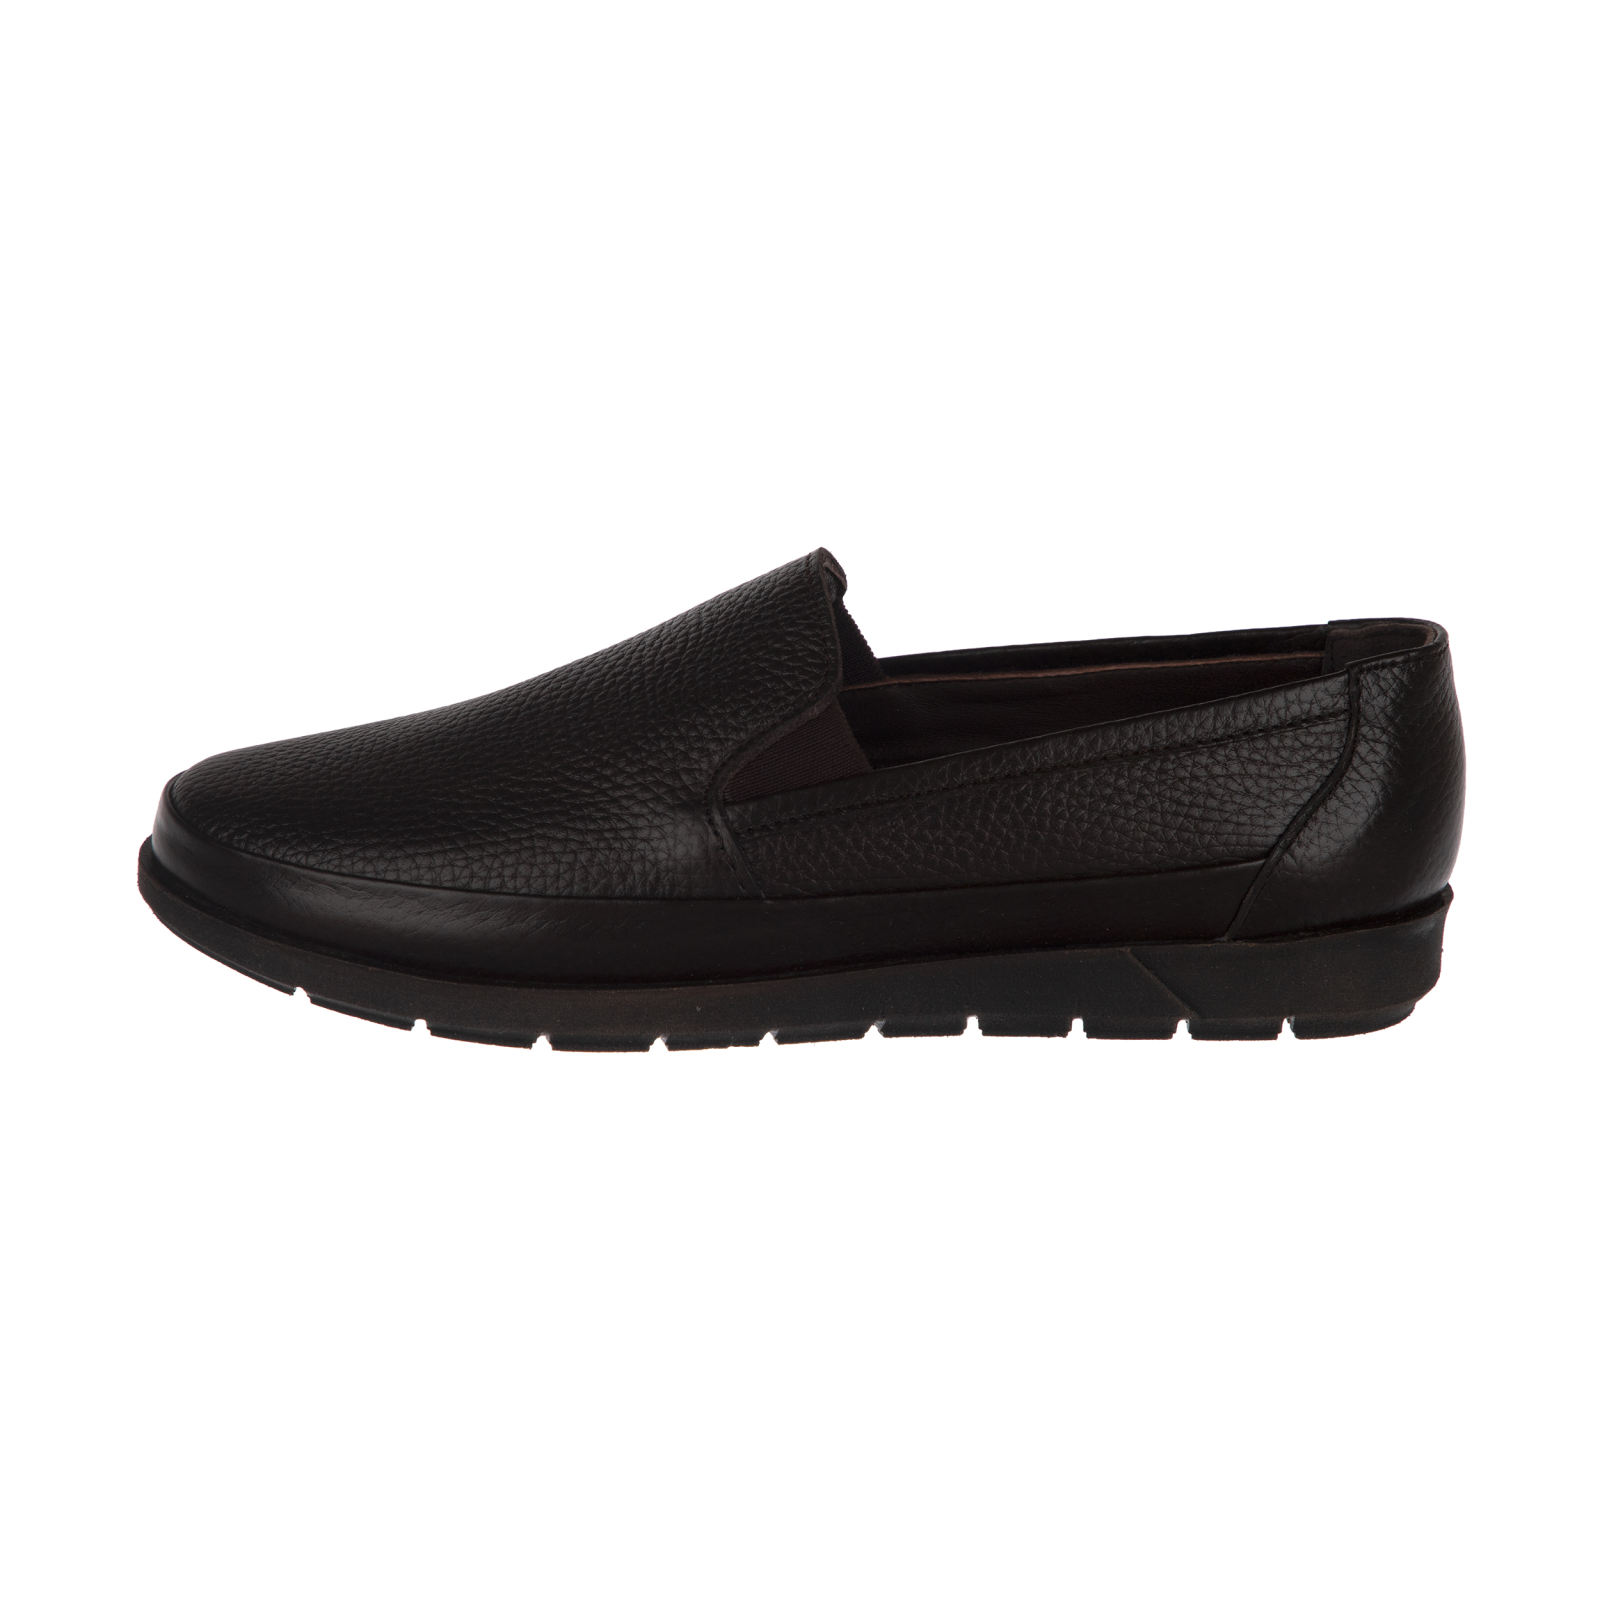 کفش روزمره زنانه سوته مدل 3069A500104 -  - 2